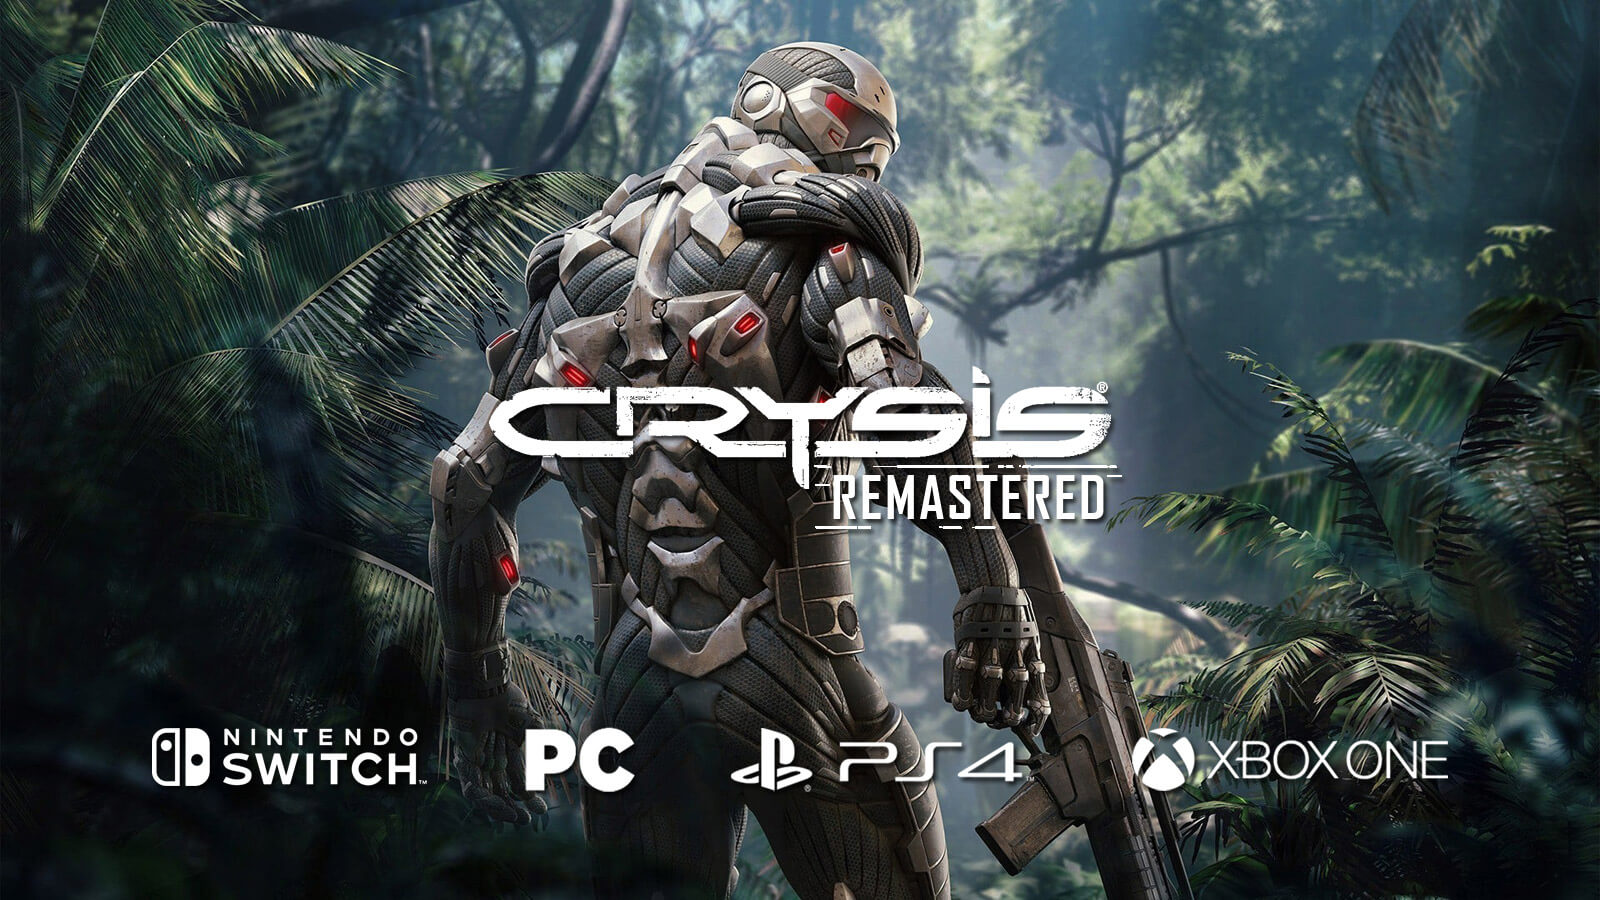 Crysis-Remastered-Leaked.jpg